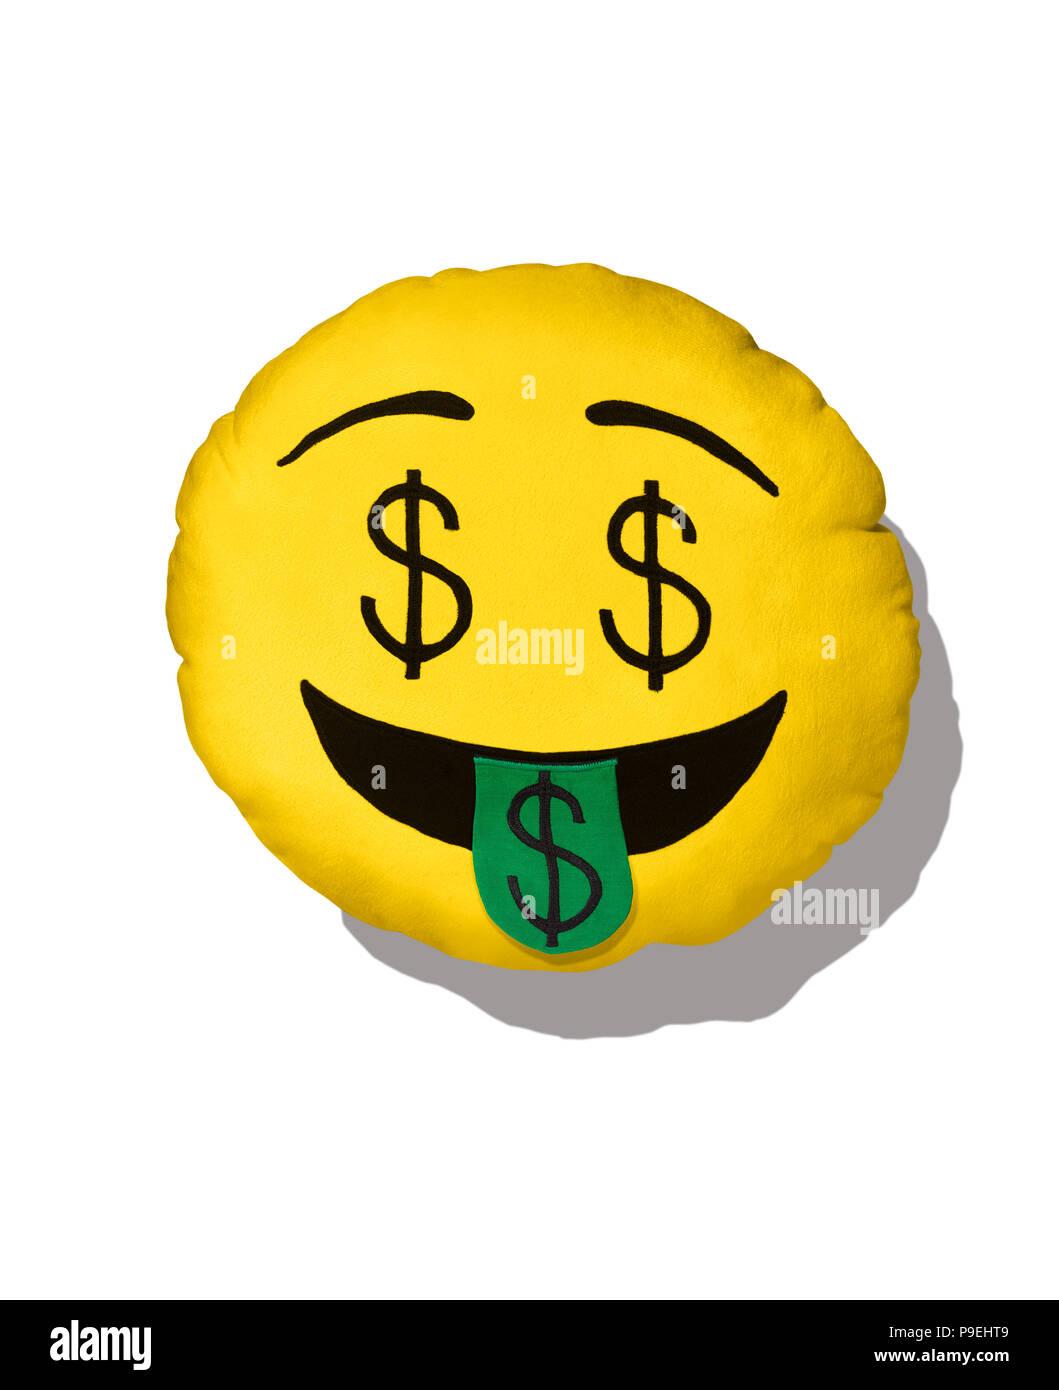 A colourful shot of the dollar sign Emoji cushion. - Stock Image